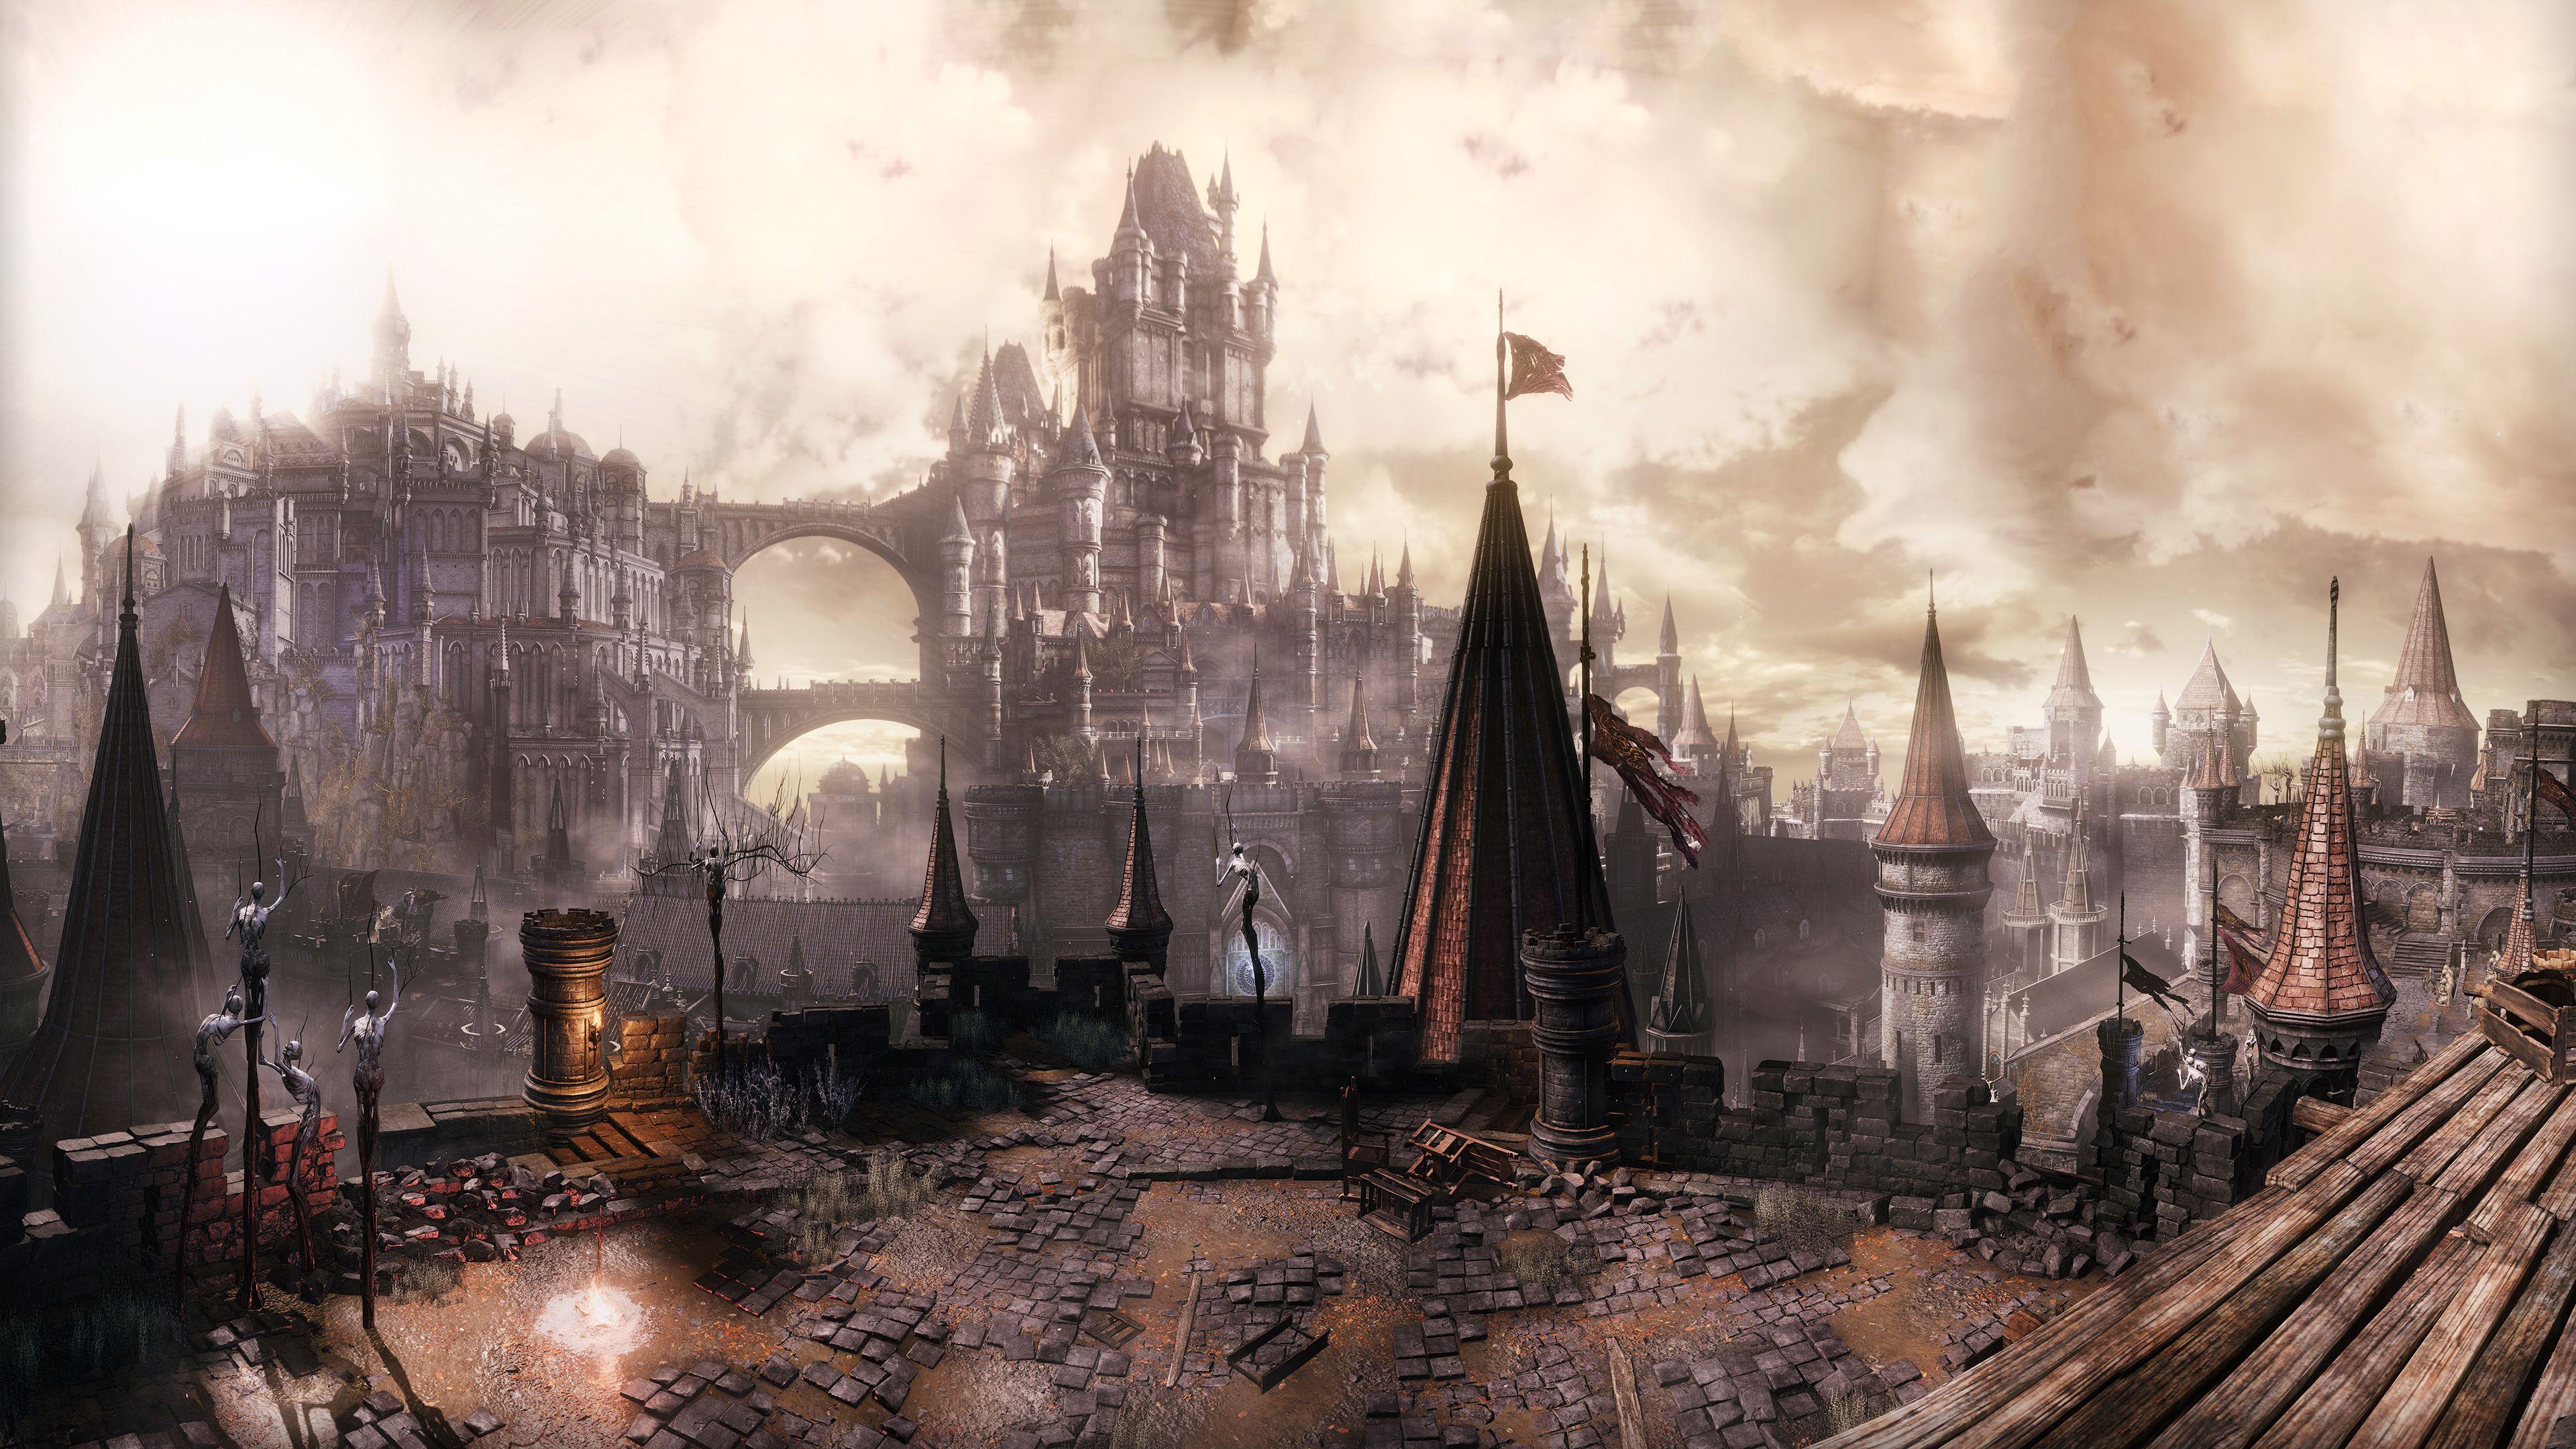 Dark Souls Iii 4k Wallpaper High Resolution Part 4 Gaming Games Gamer Videogames Videogame Ani Dark Souls Wallpaper Dark Souls Dark Souls Locations